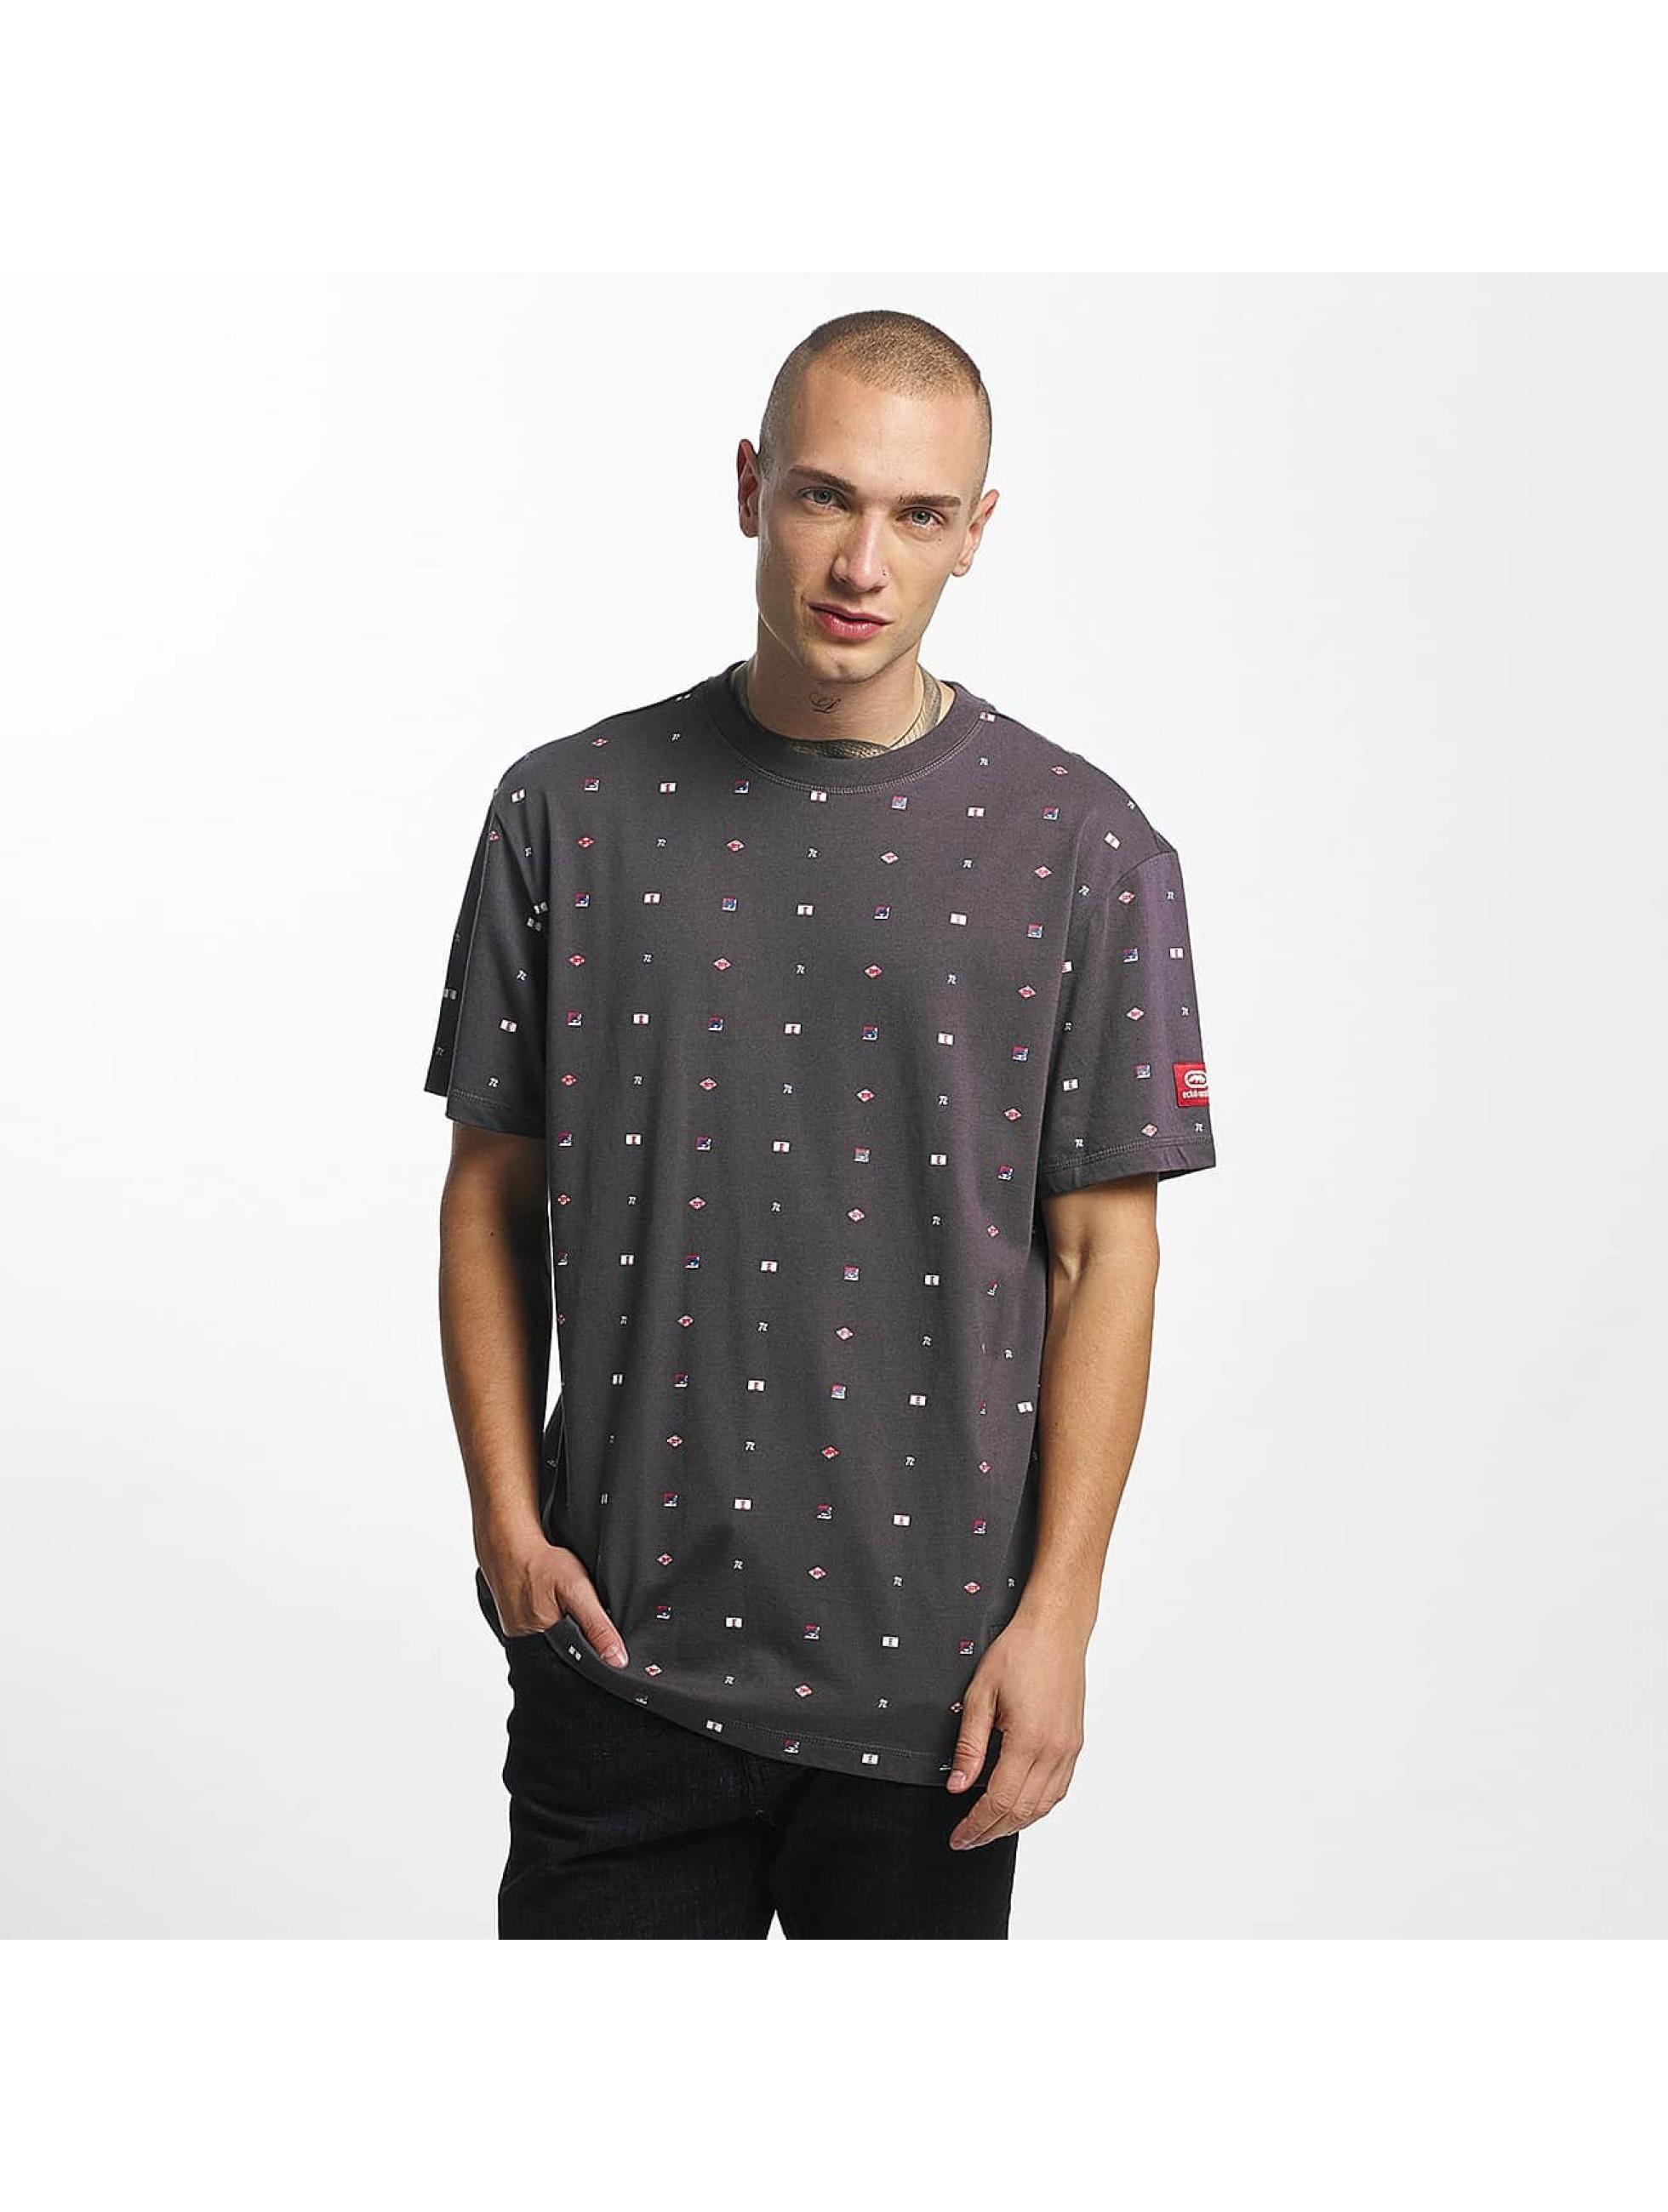 Ecko Unltd. / T-Shirt CapeVidal in grey 6XL